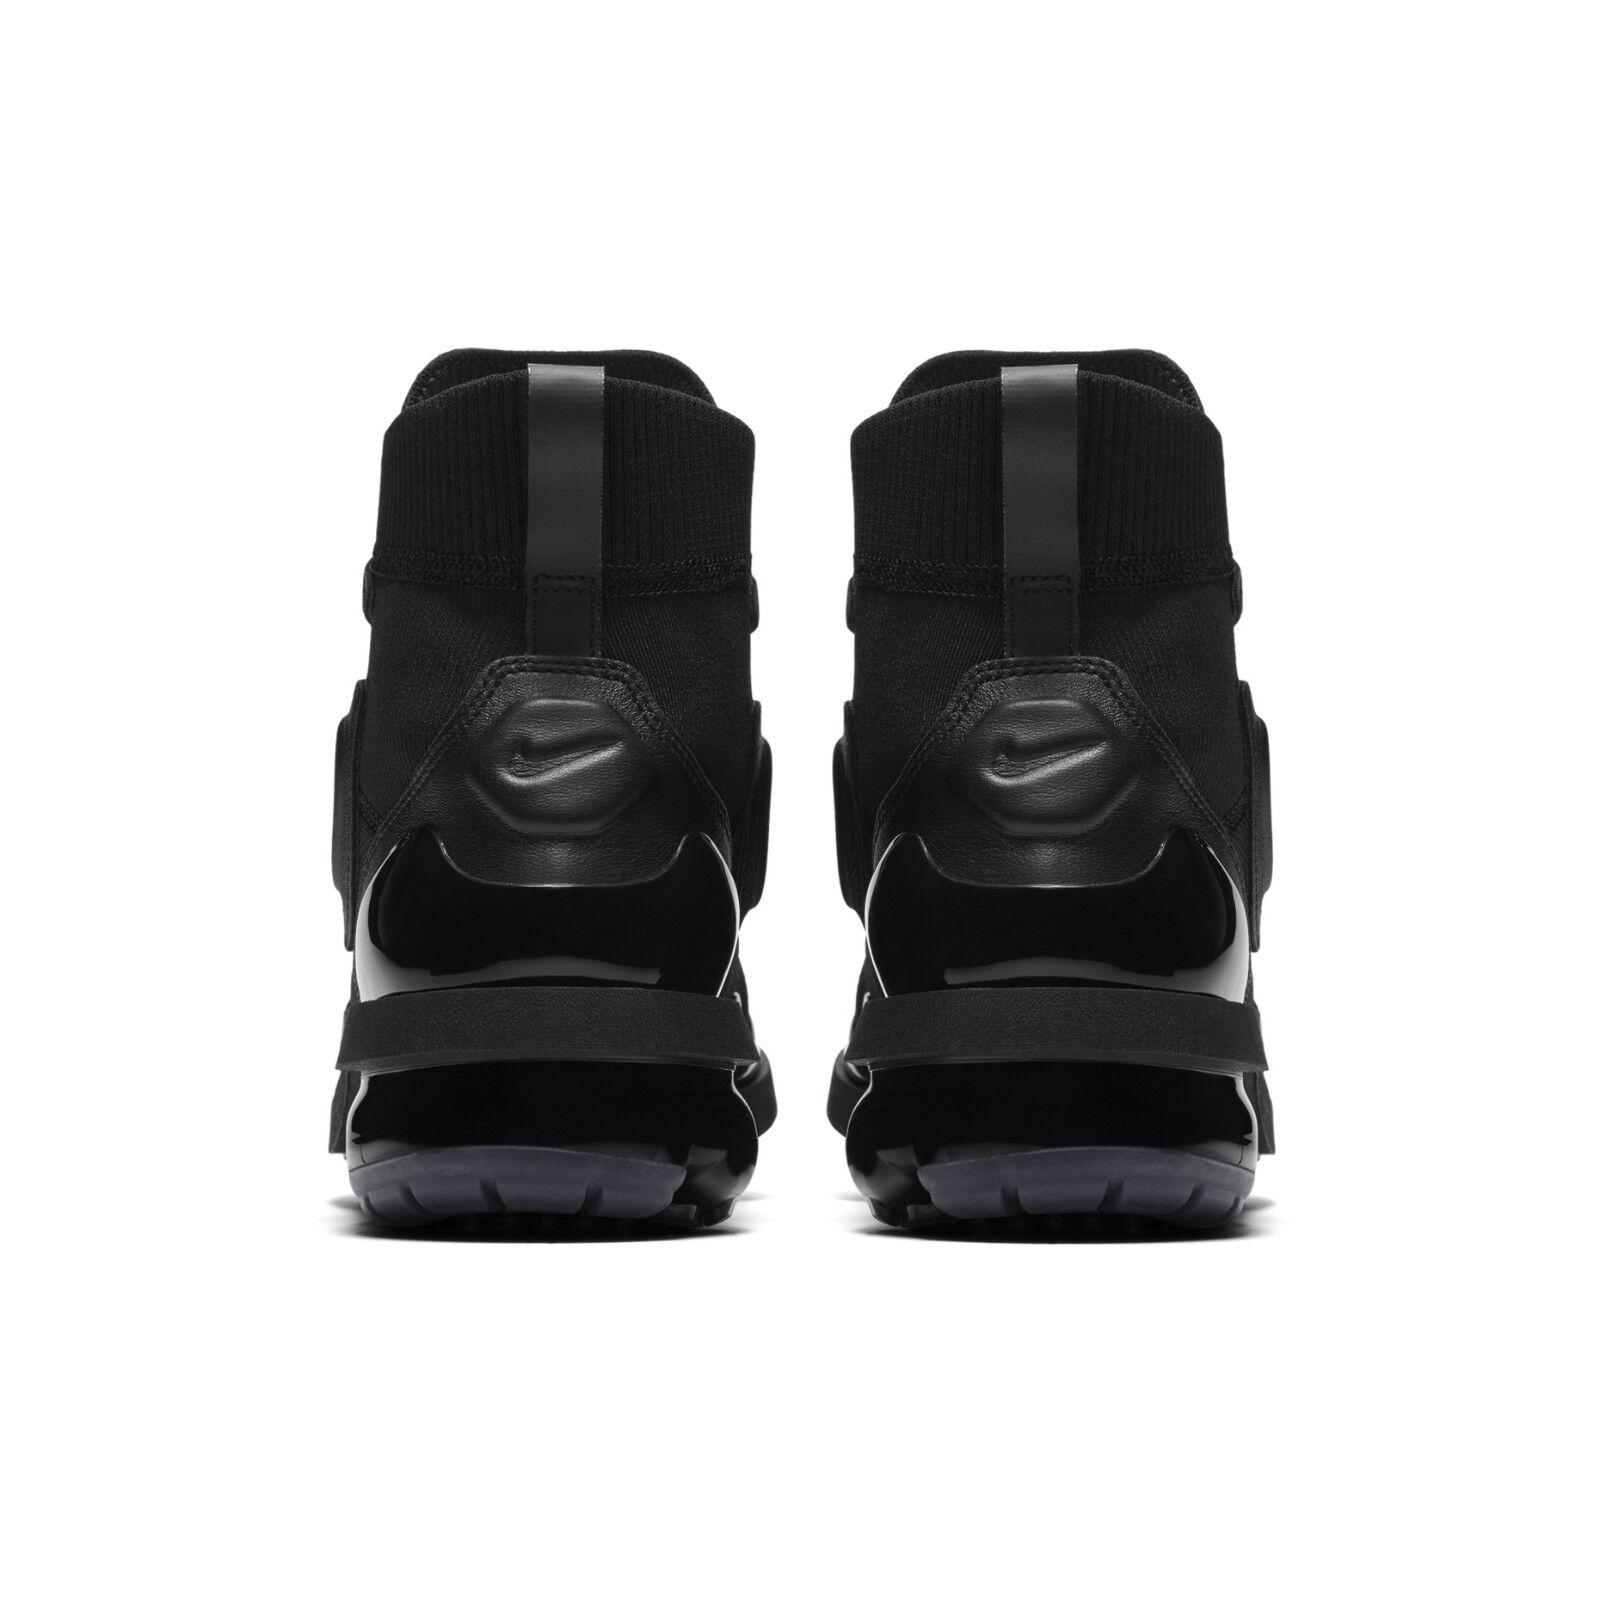 897c83e10b7 Nike Womens Wmns Vapormax Light II 2 Hi Triple Black Fashion Shoes AO4537- 001